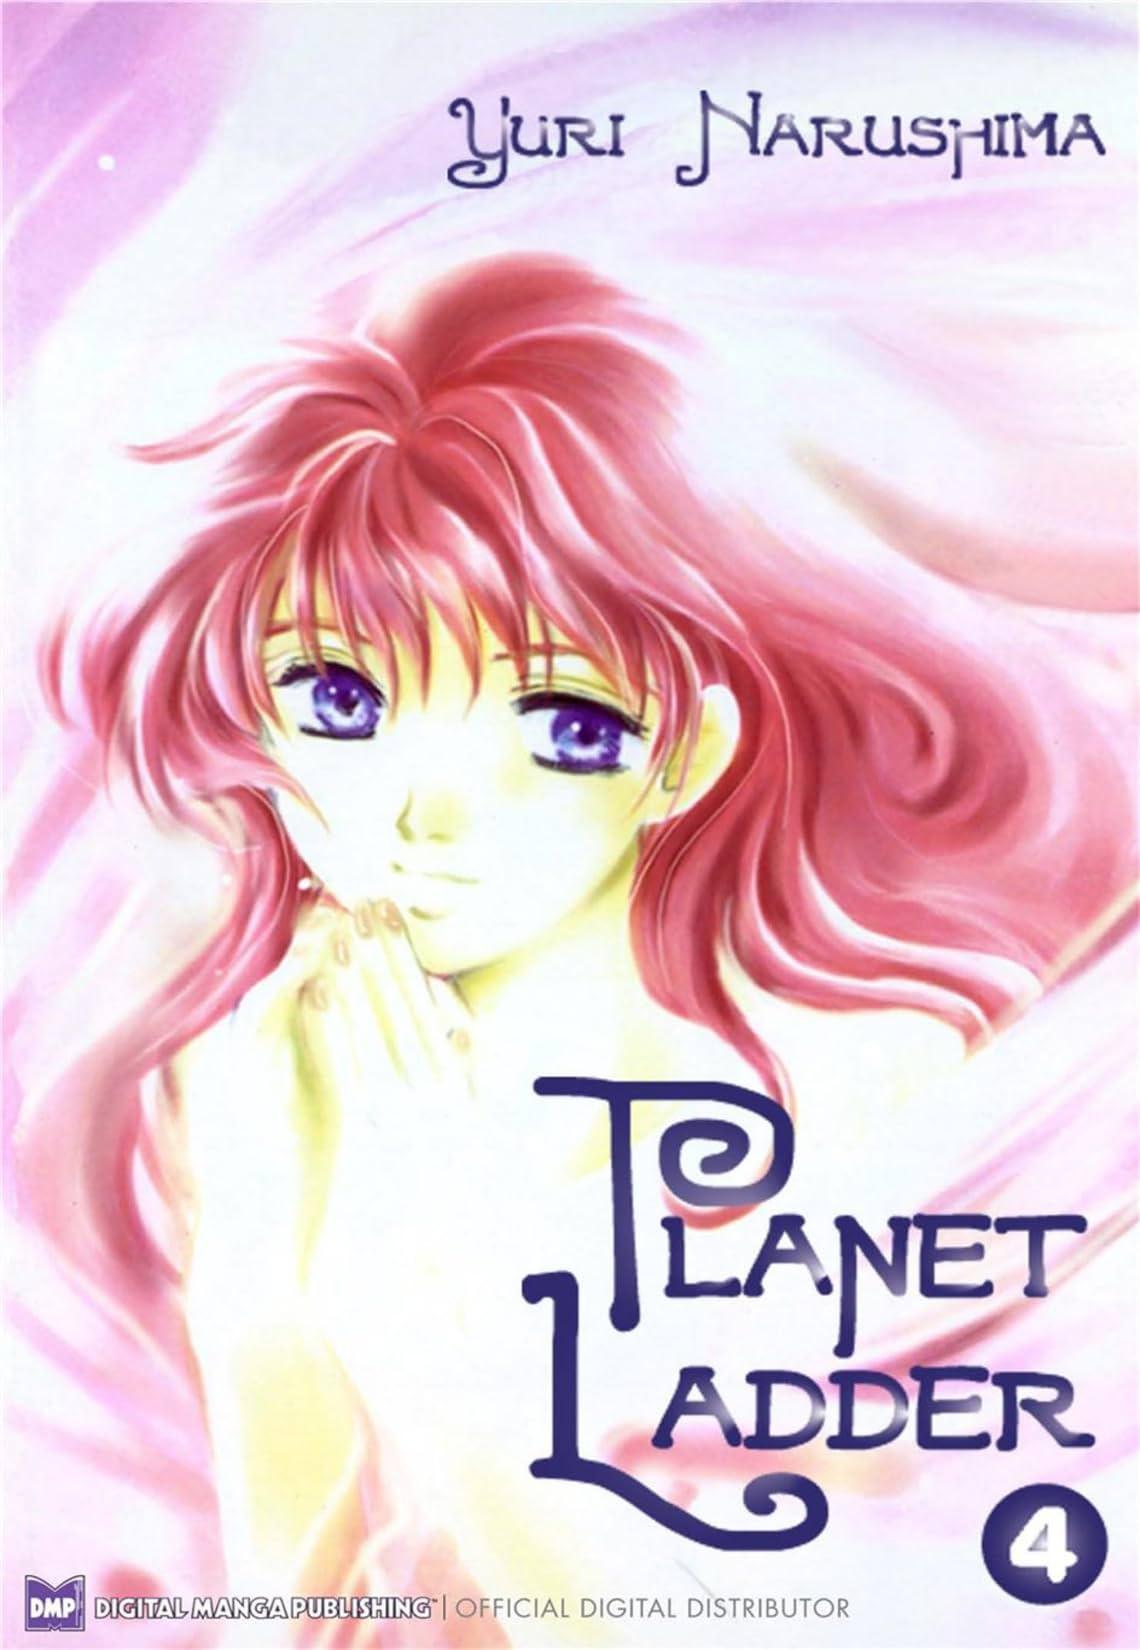 Planet Ladder Vol. 4